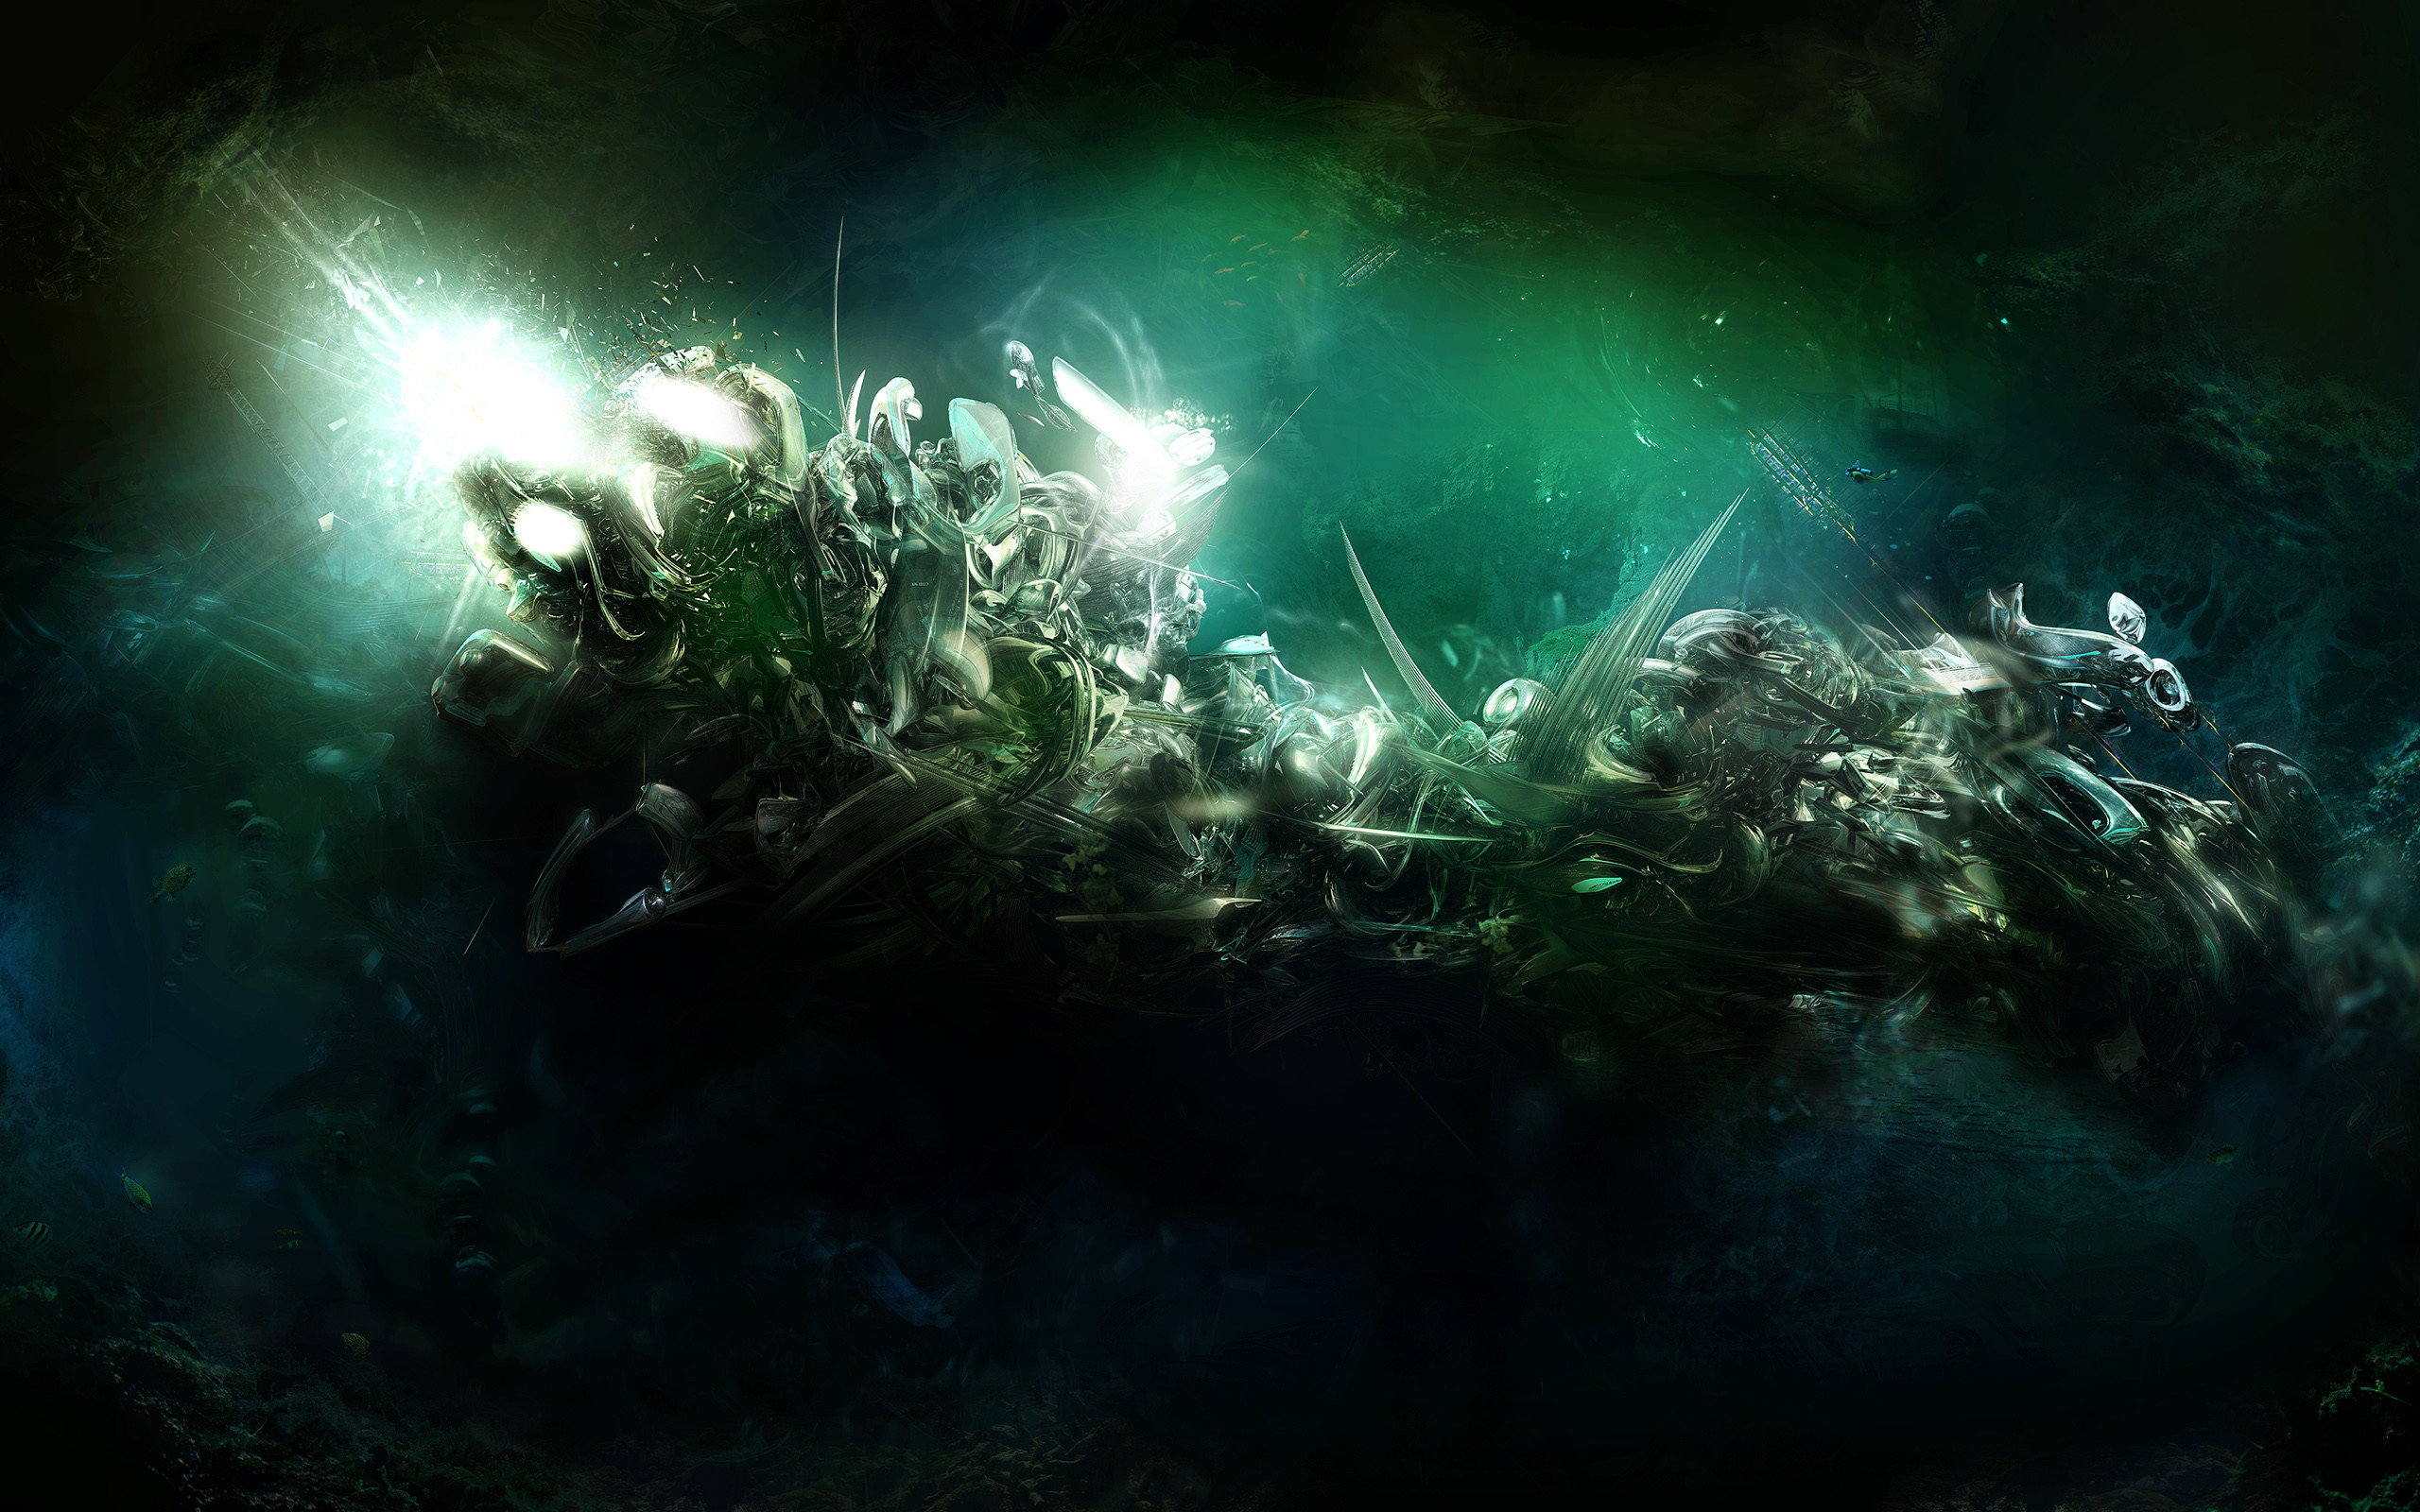 Dark Abstract Predator wallpaper from Dark wallpapers